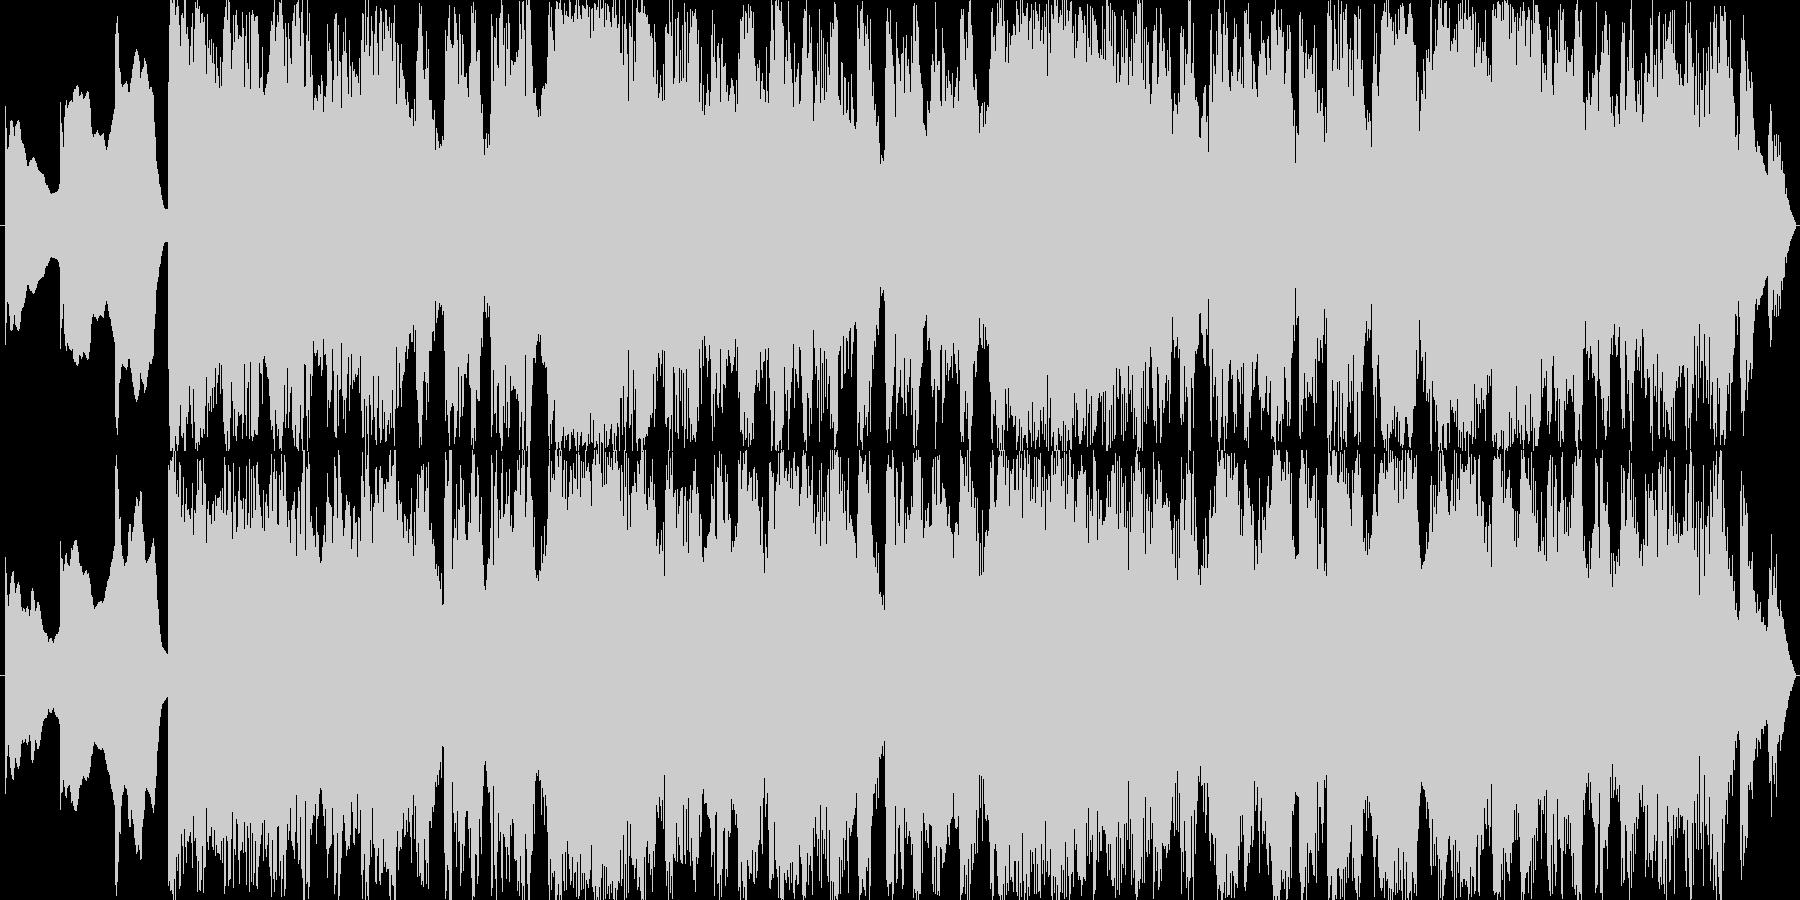 Pop band soundの未再生の波形